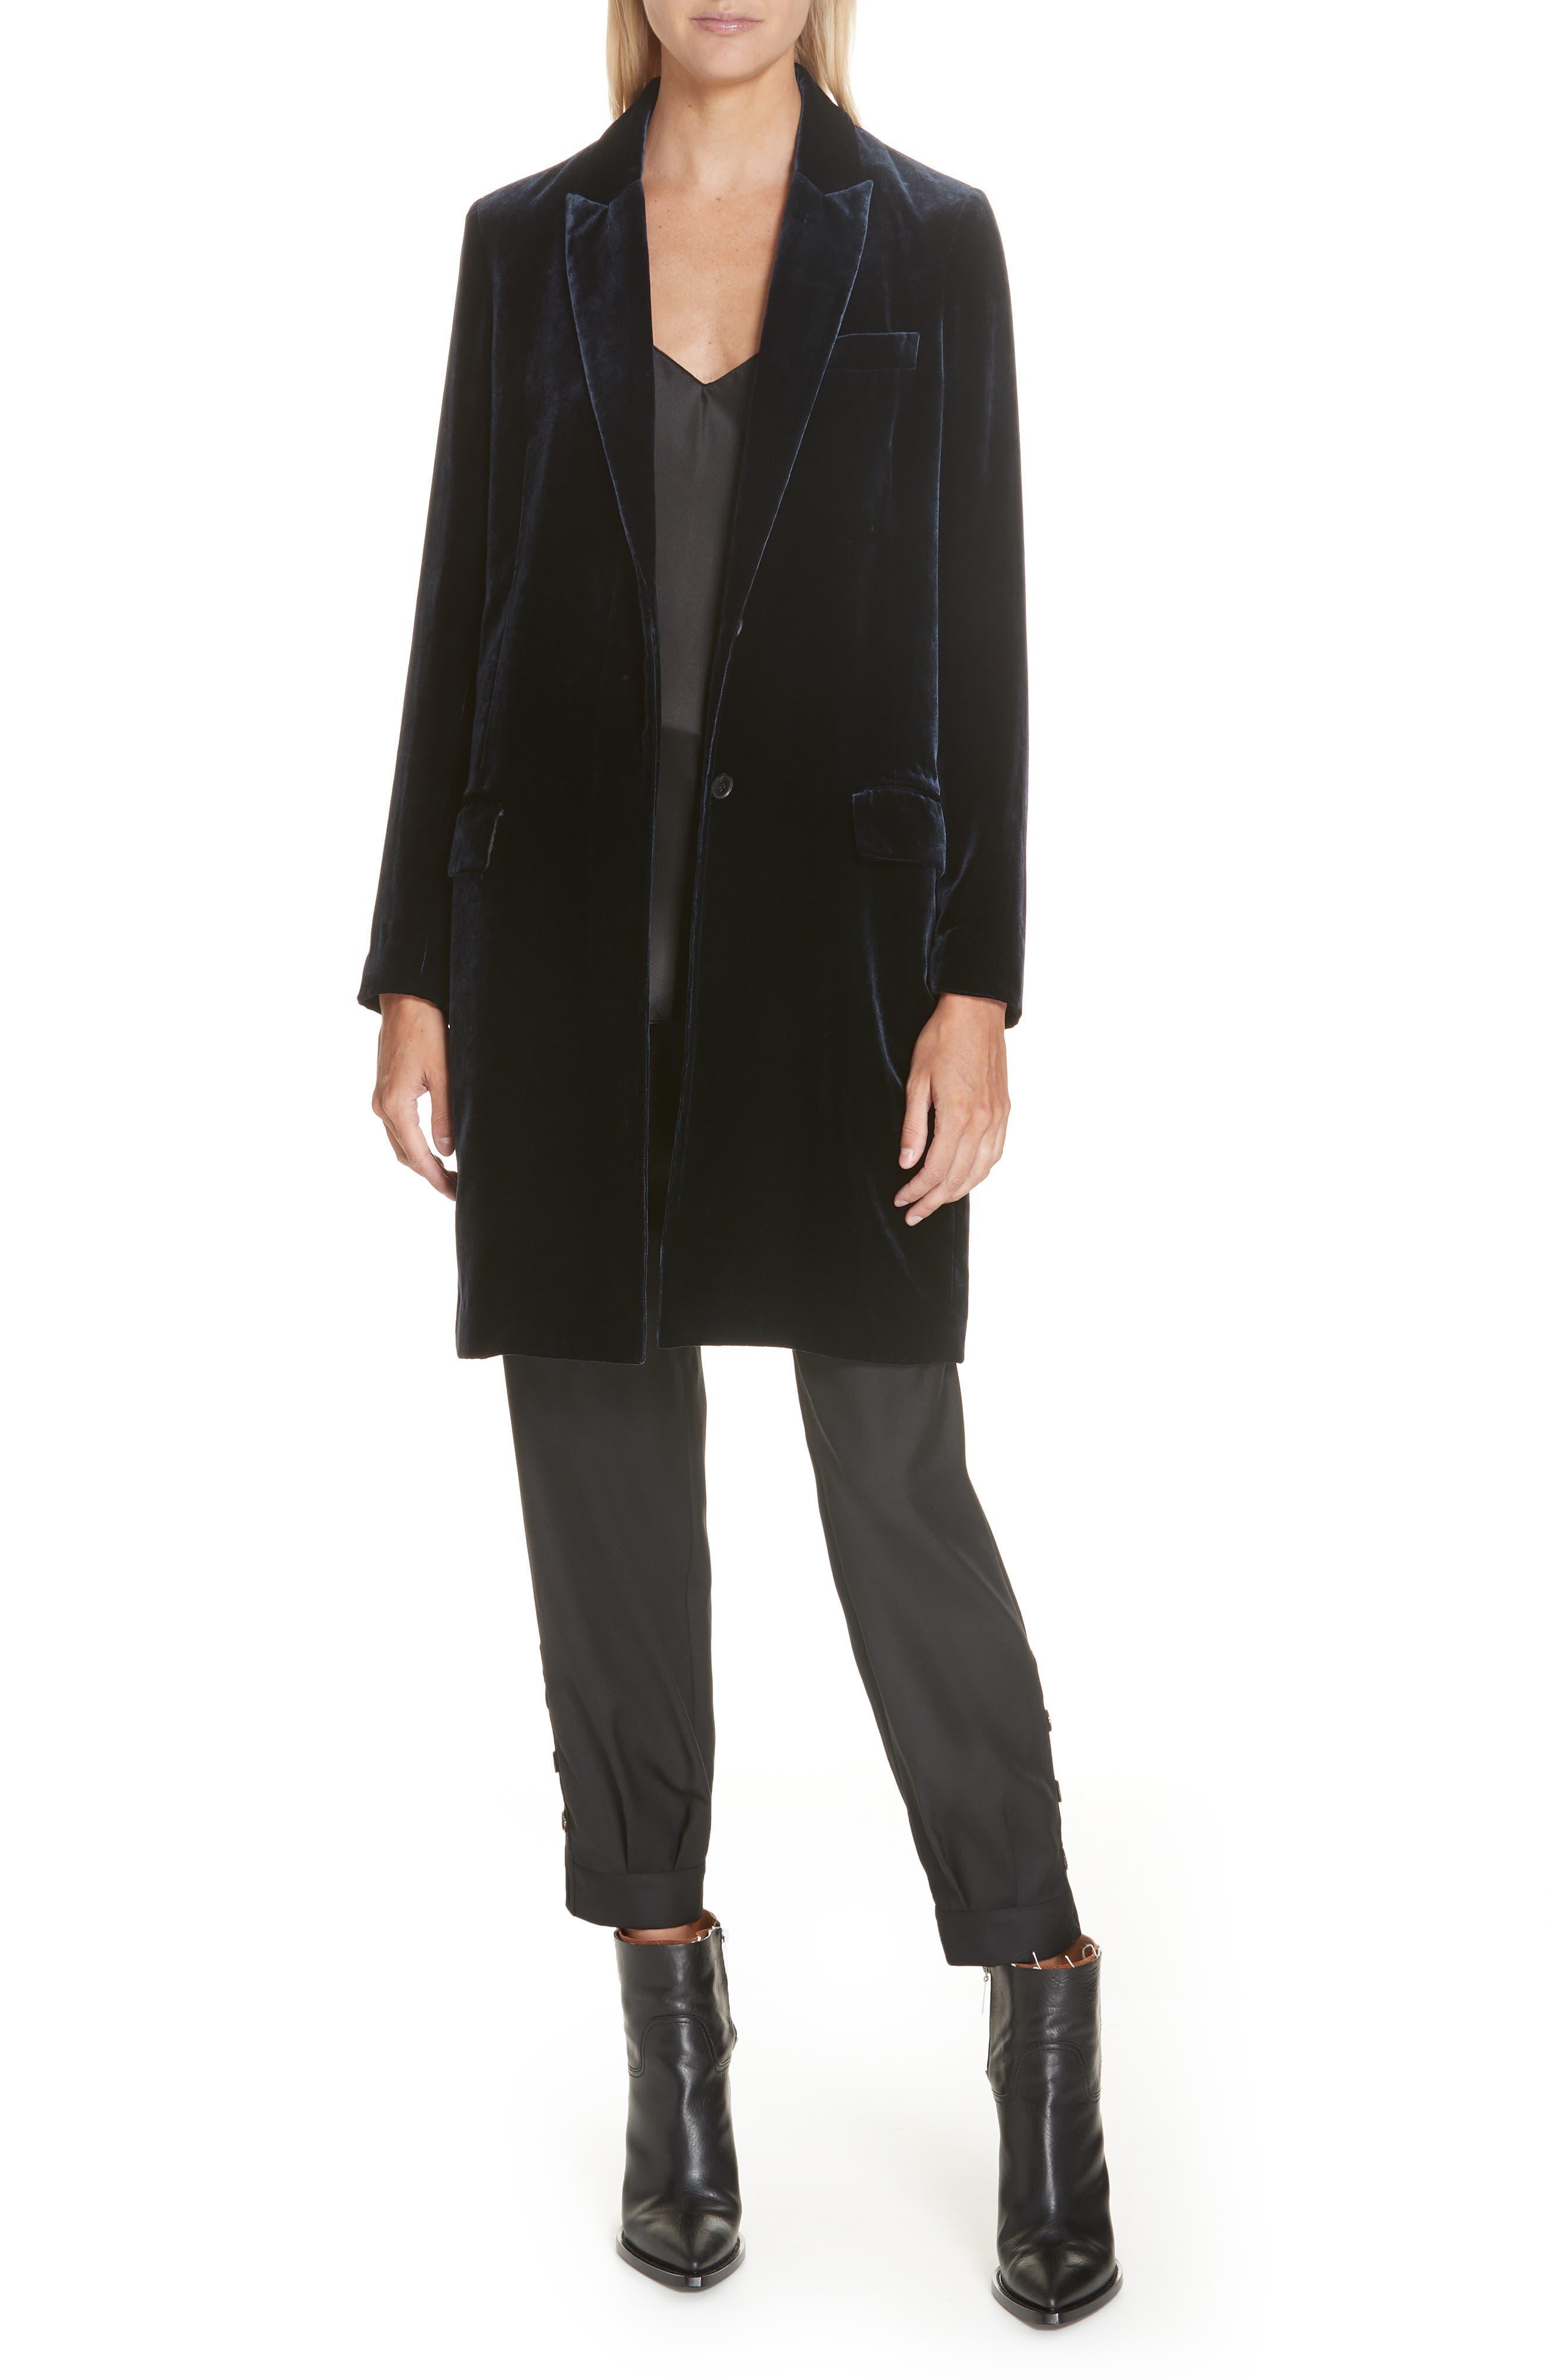 NILI LOTAN, Bertina Pleated Wool Crop Pants, Alternate thumbnail 8, color, BLACK